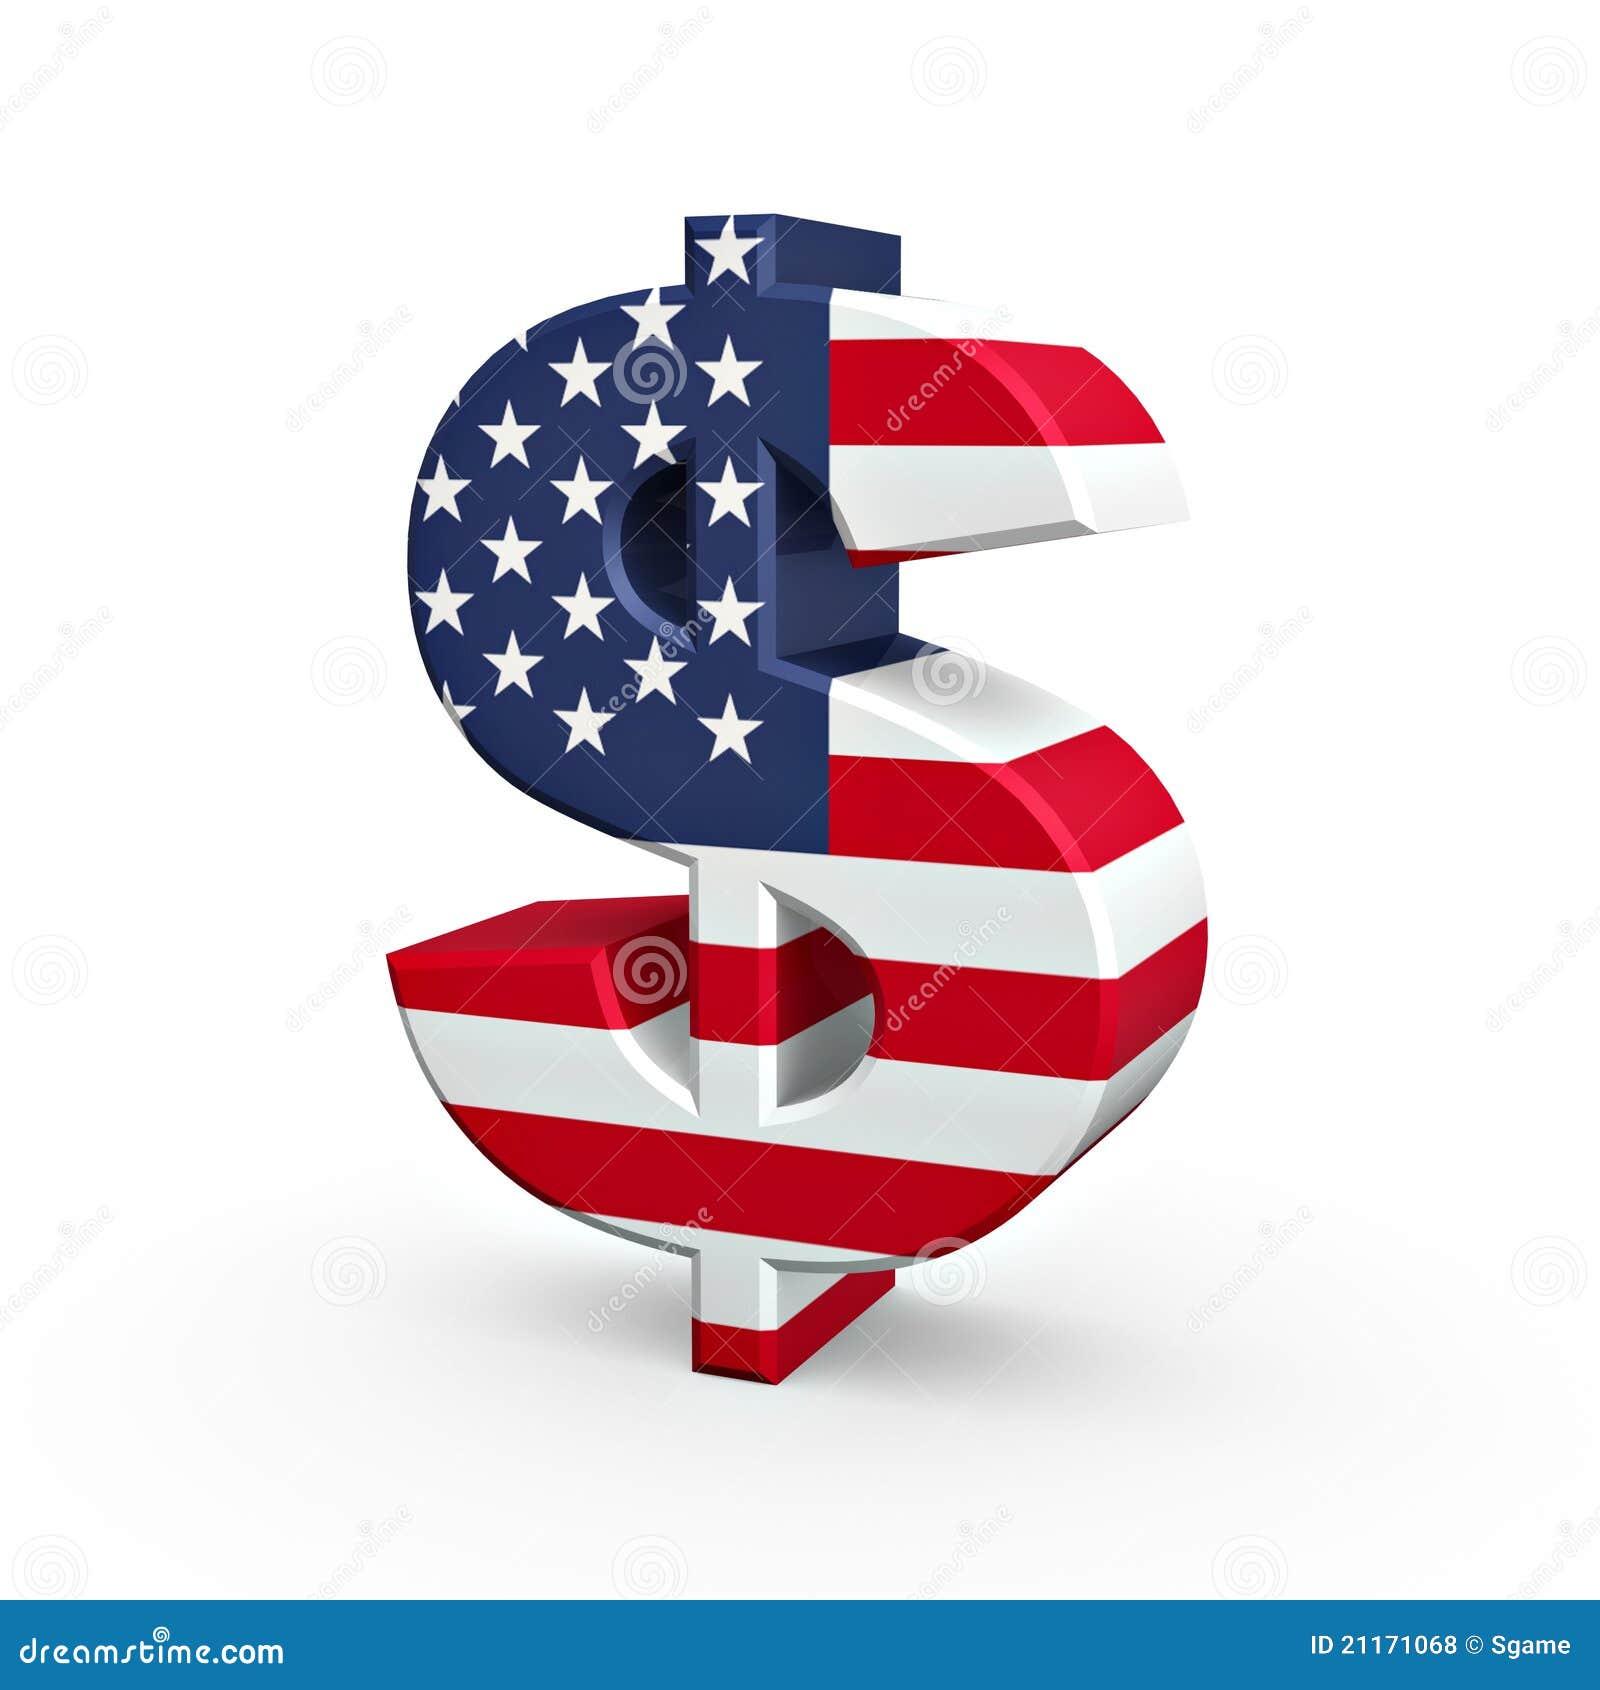 us dollar symbol royalty free stock photos image 21171068 free real estate clip art pictures Real Estate Symbols Clip Art